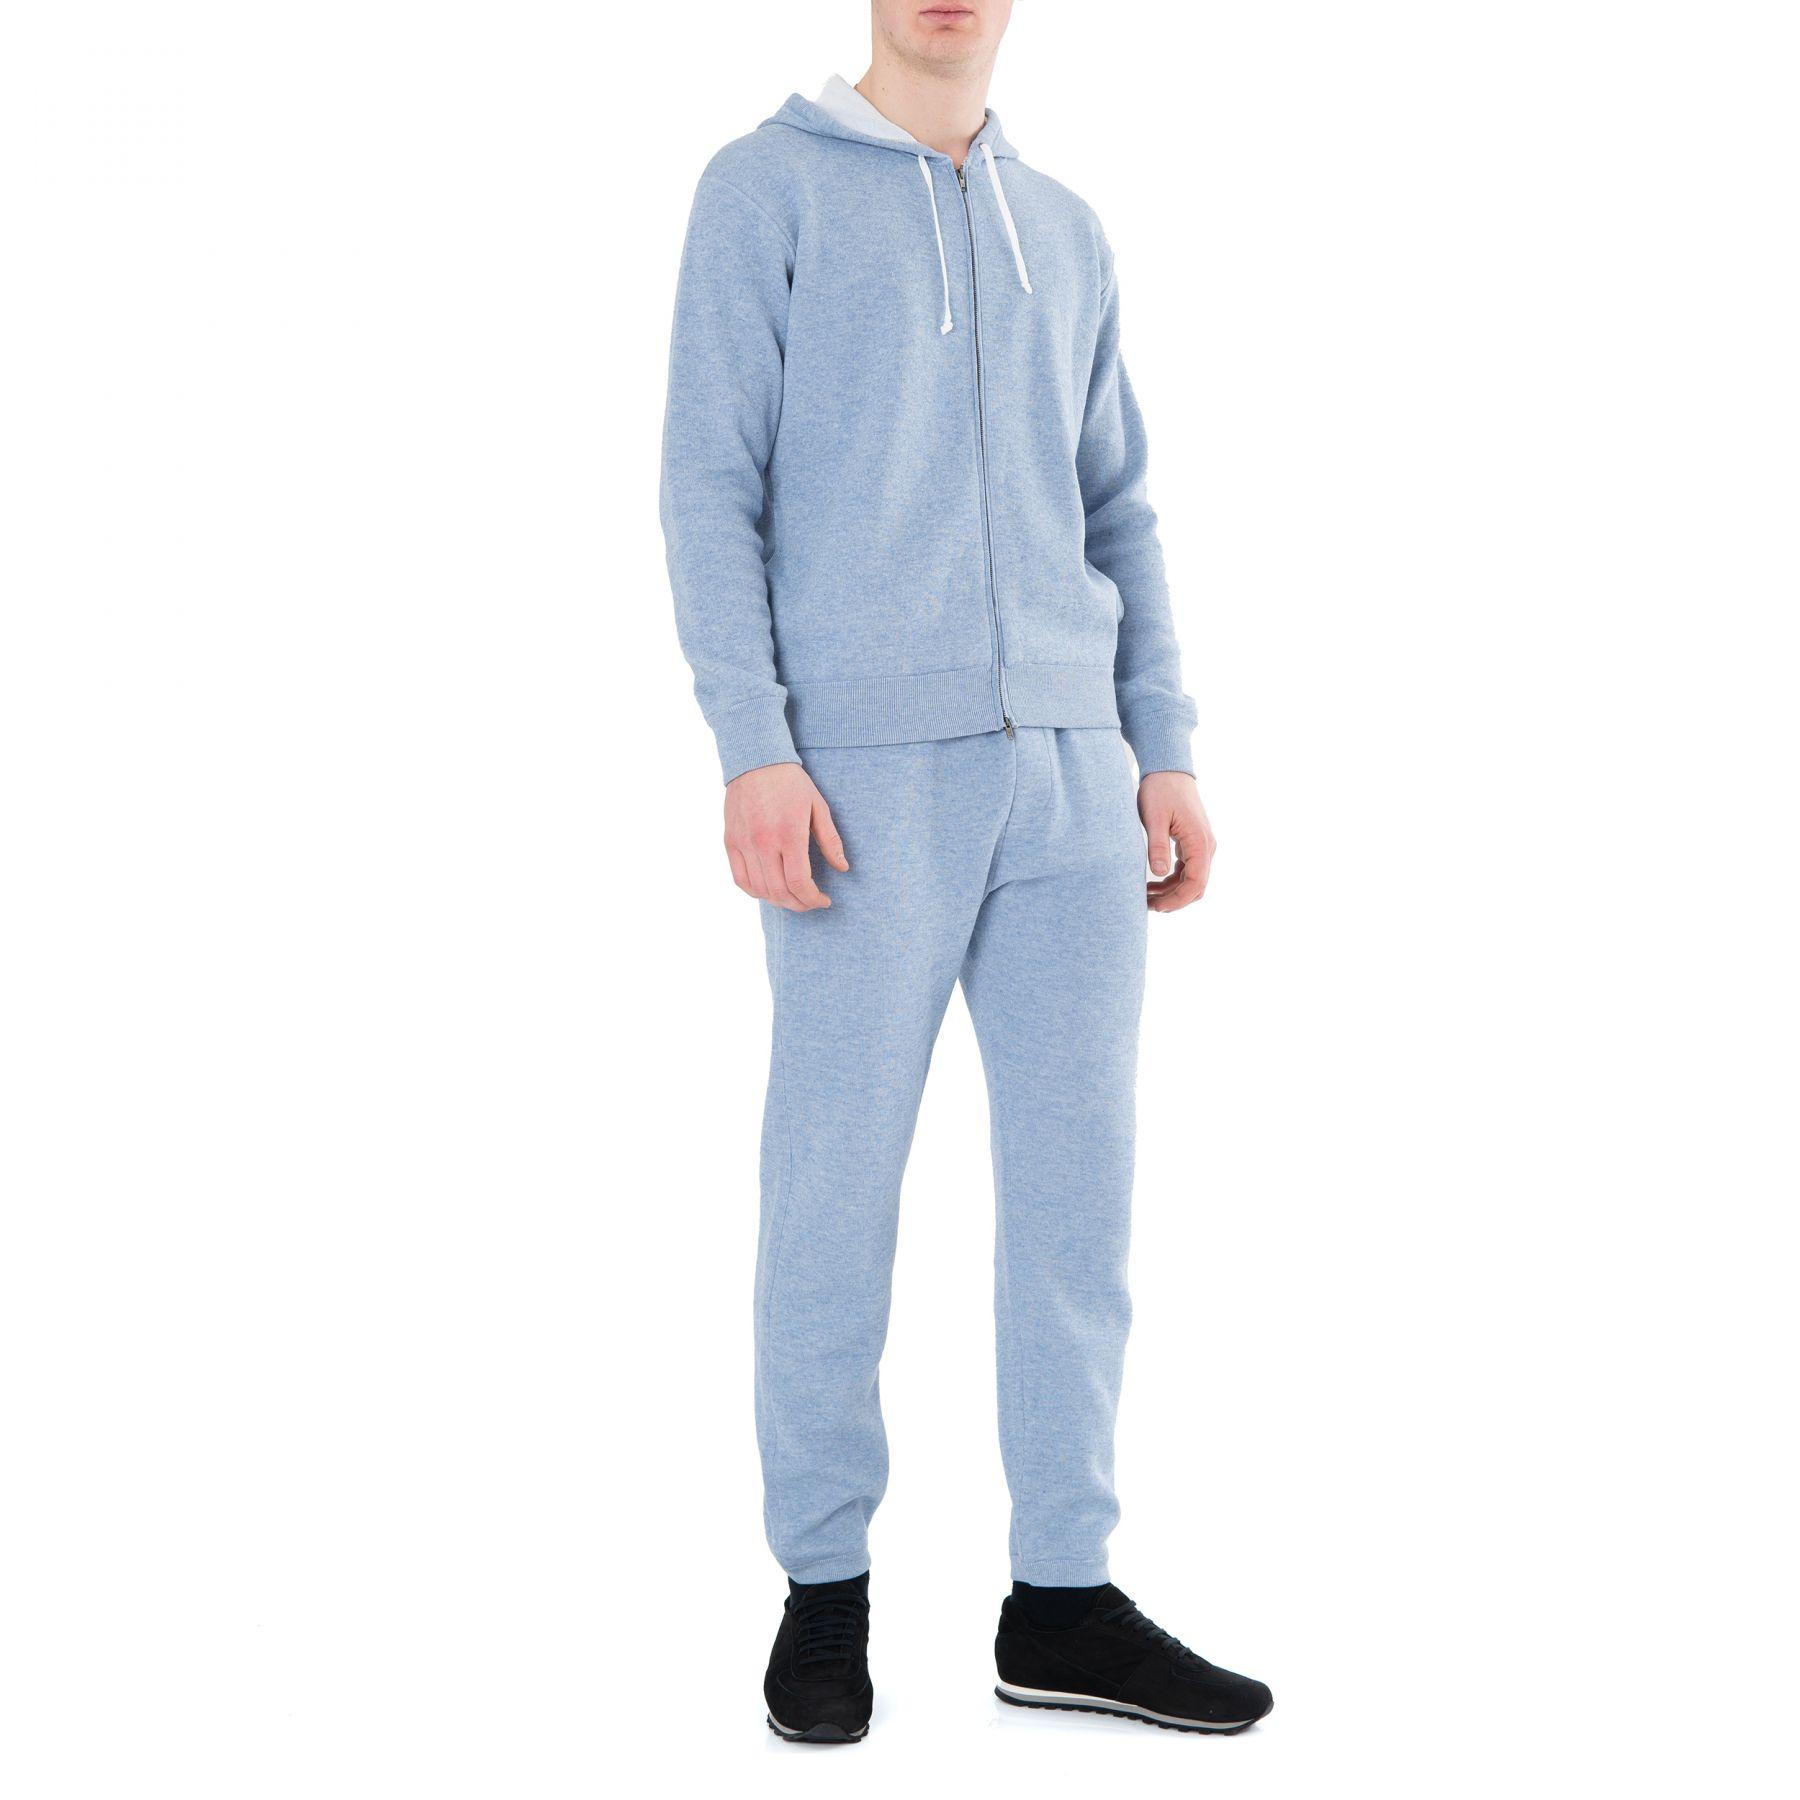 Спортивный костюм Luciano Barbera голубой